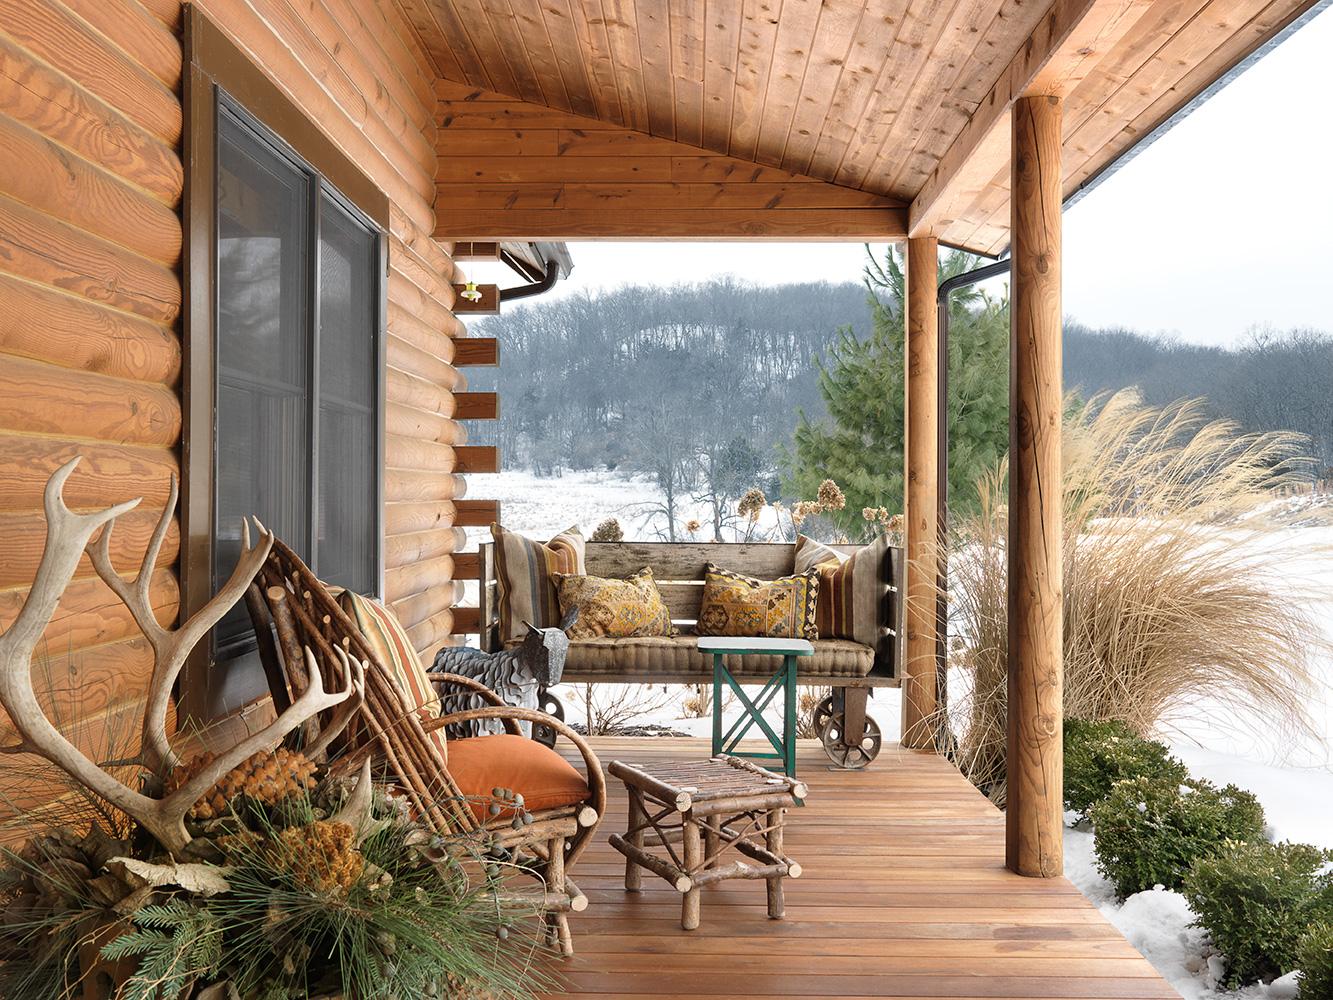 Amy-Studebaker-cabin-porch.jpg